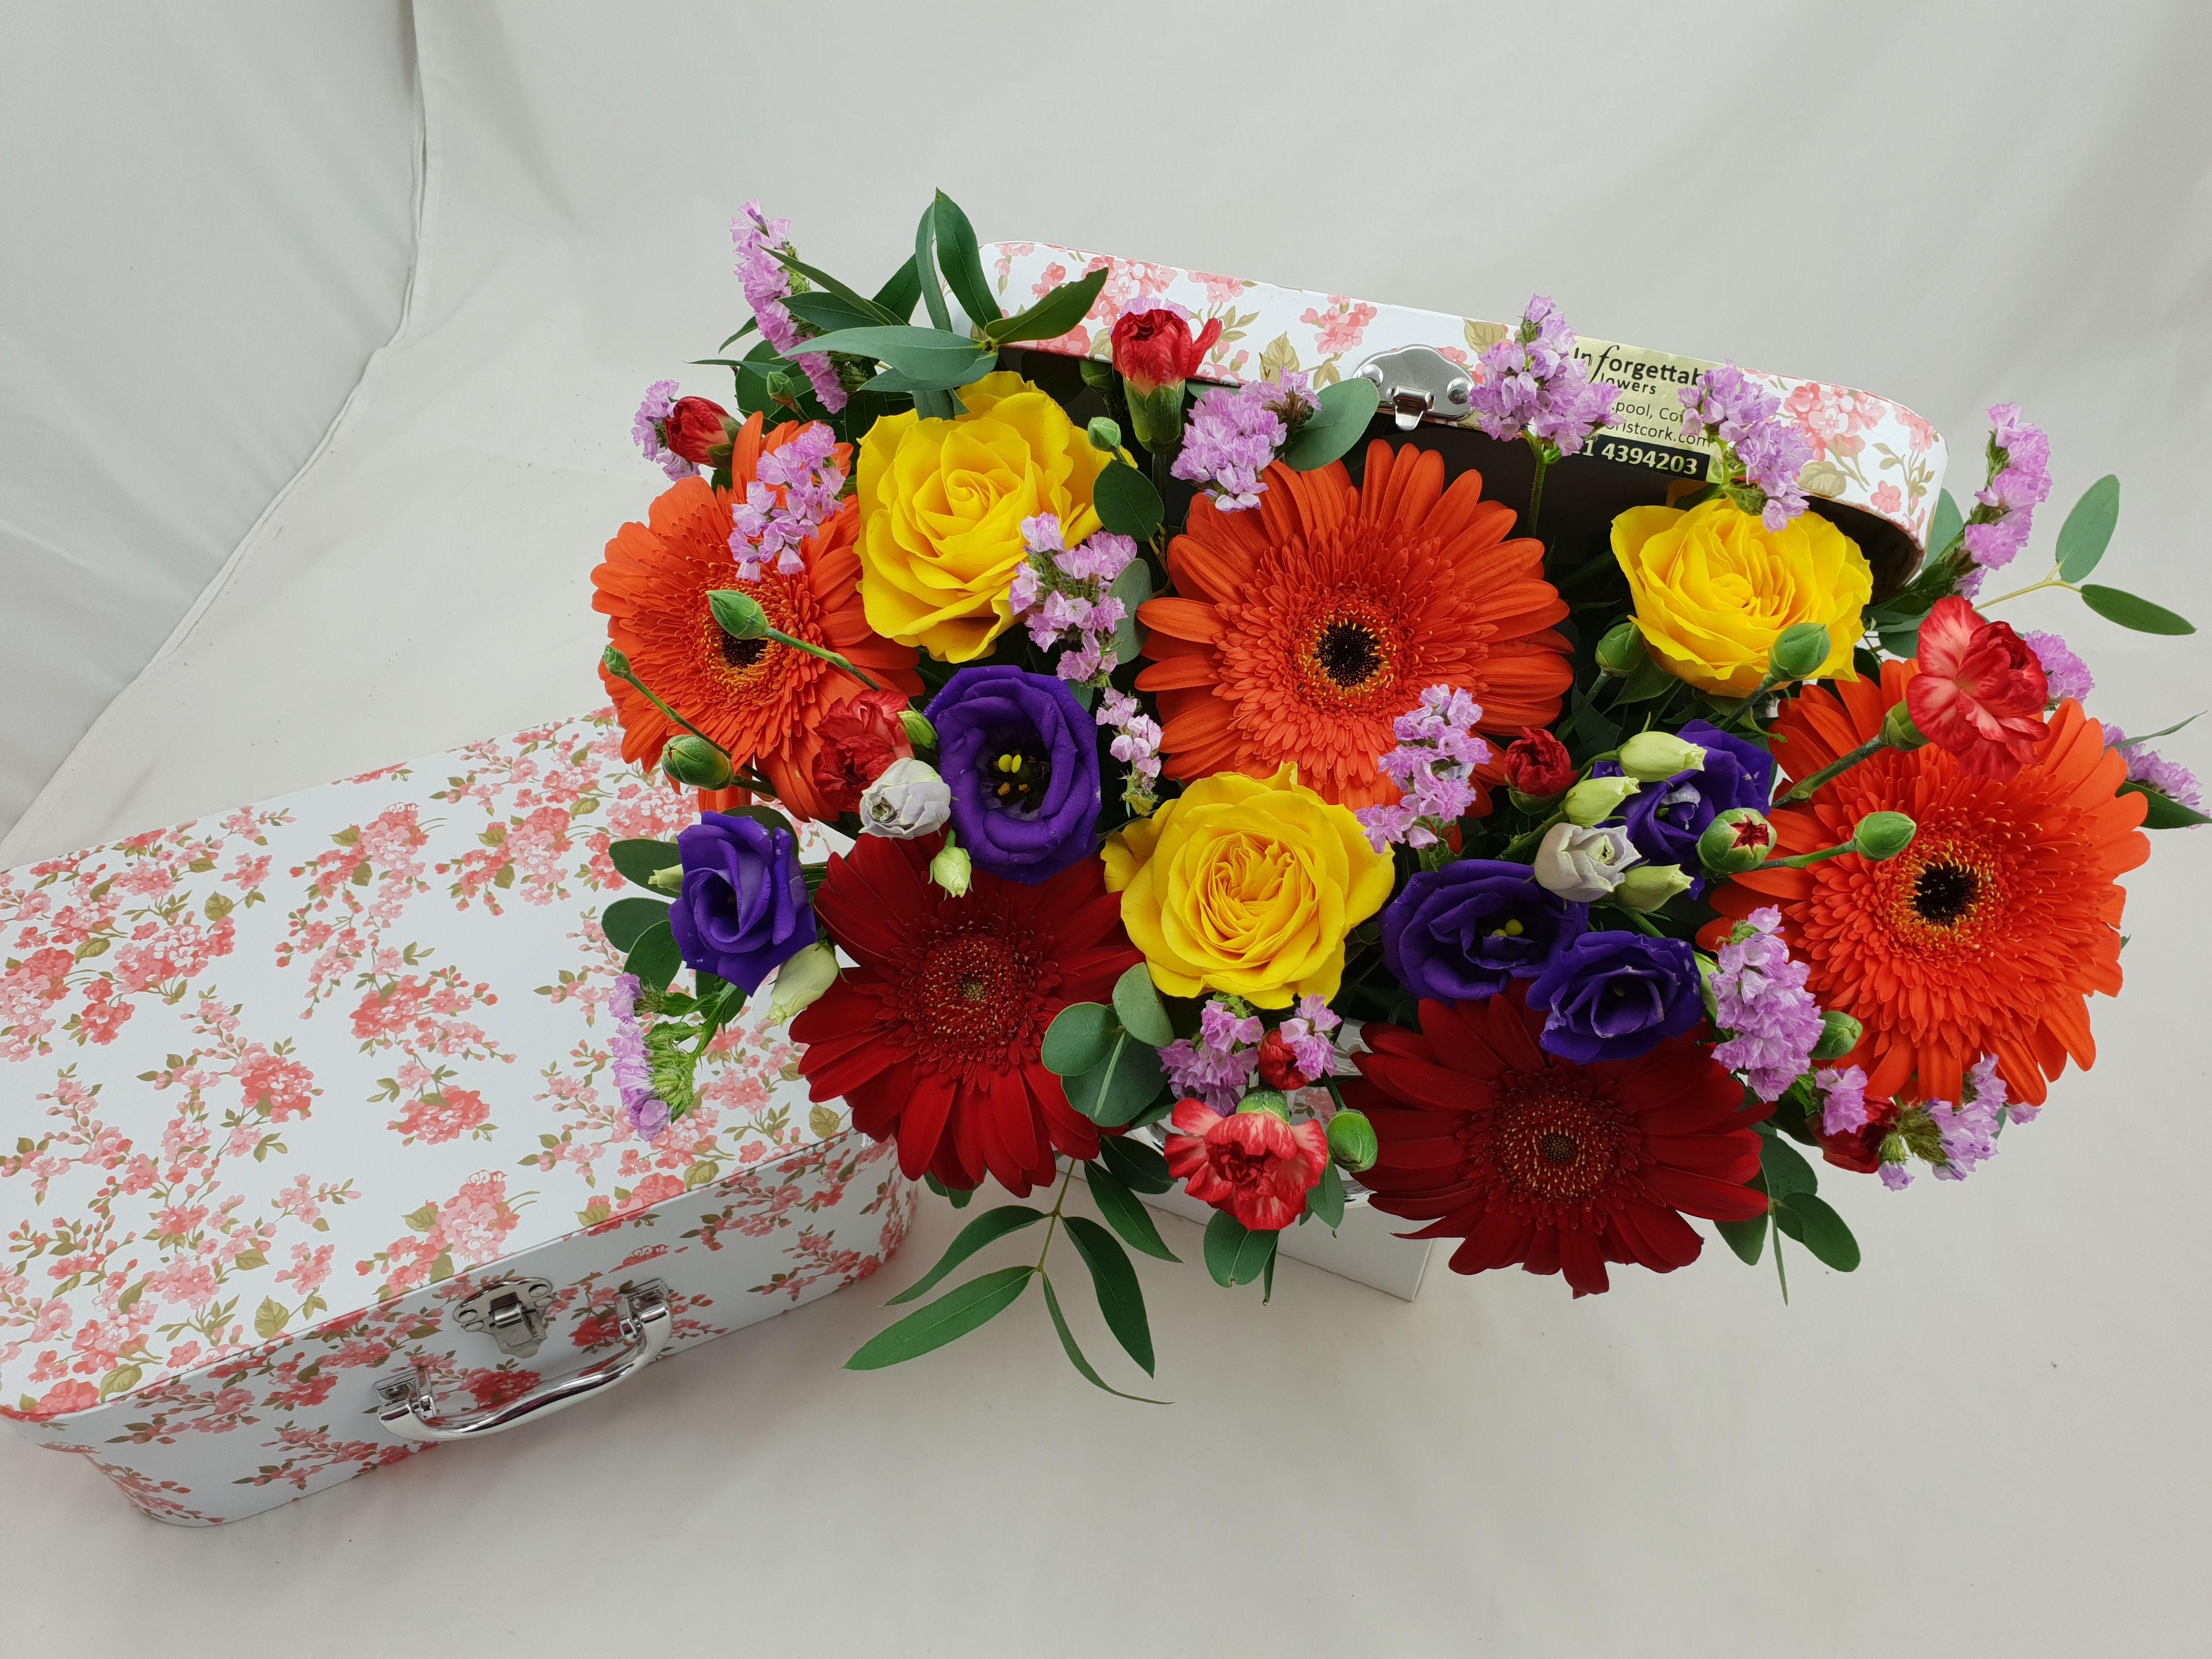 Vintage Flower Suitcase Vintage flowers, Flower delivery